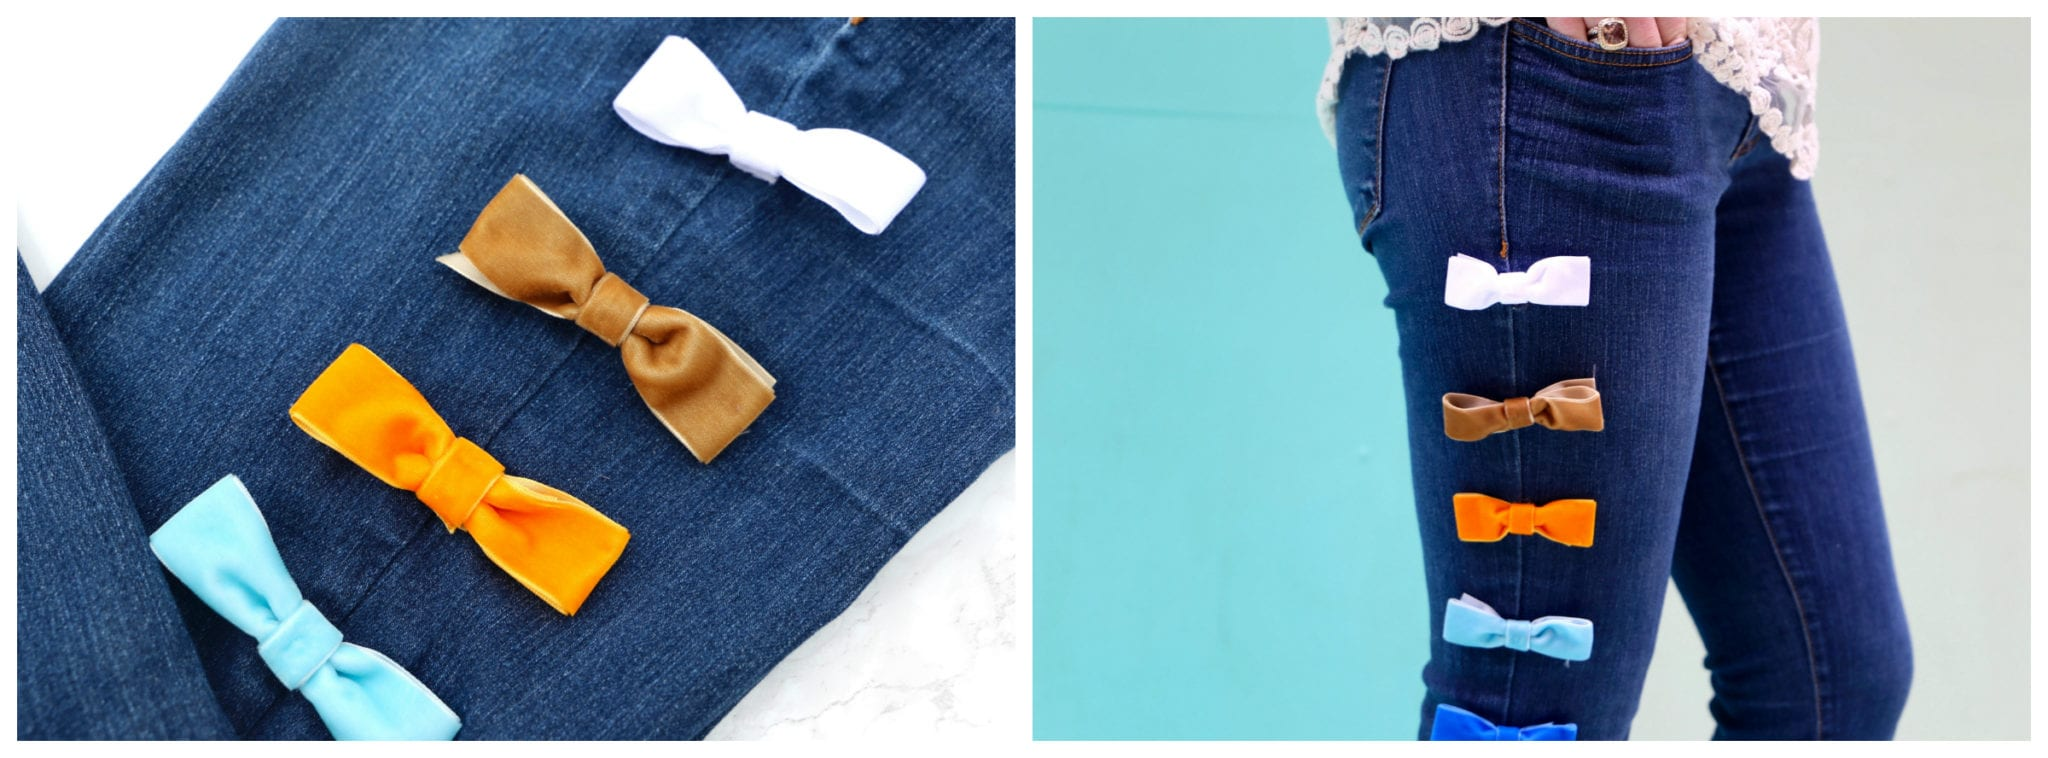 Steps to DIY velvet bow jeans, designer dupe, steal or splurge bow jeans, designer velvet bow jeans, redesign